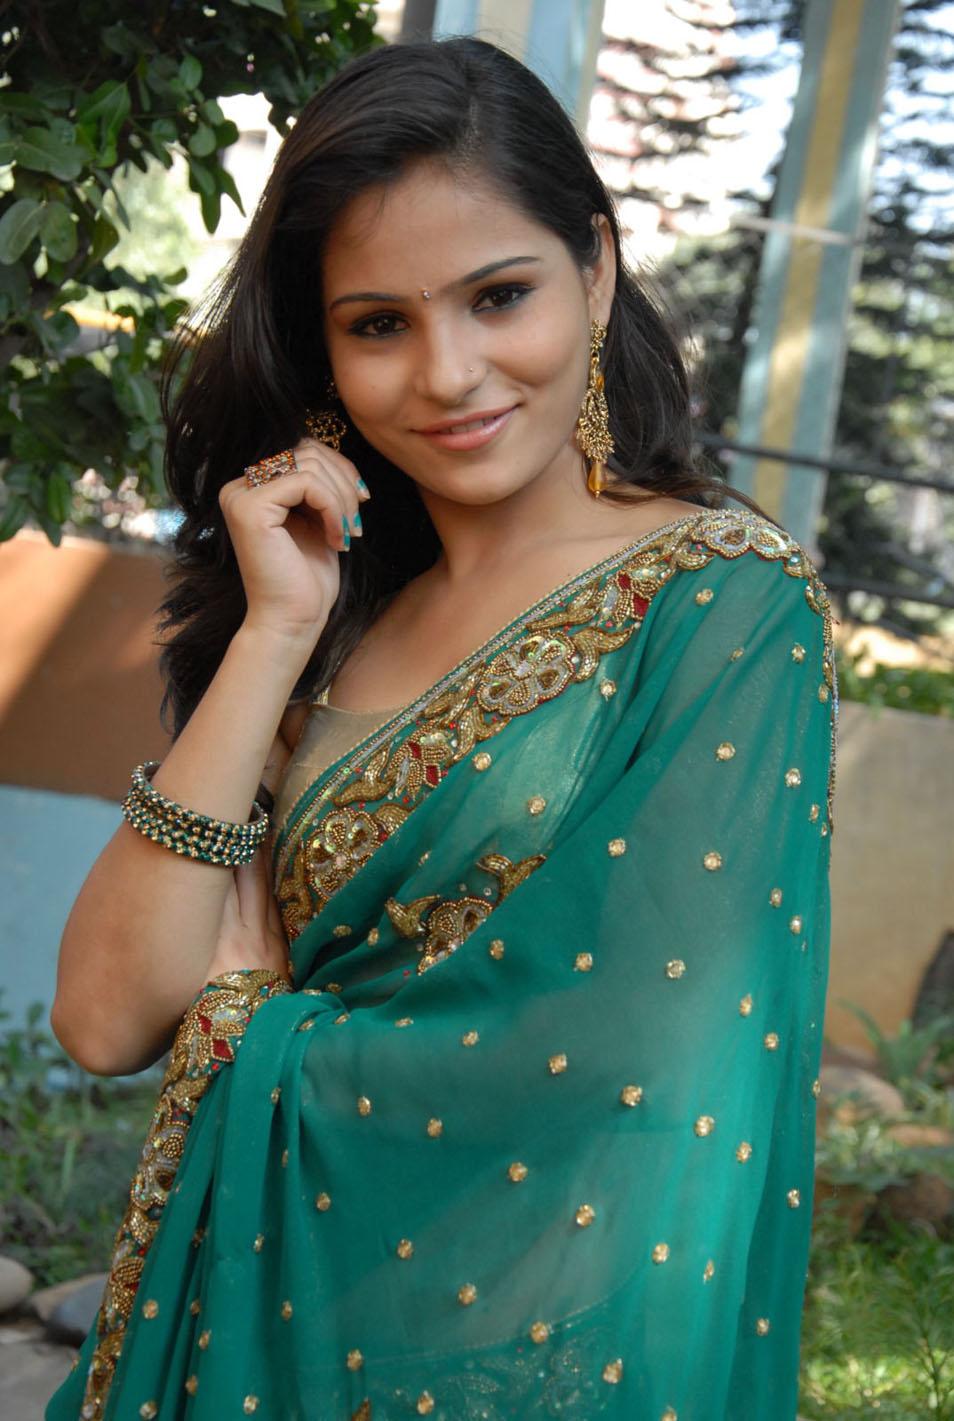 Shweta Vijay - YouTube